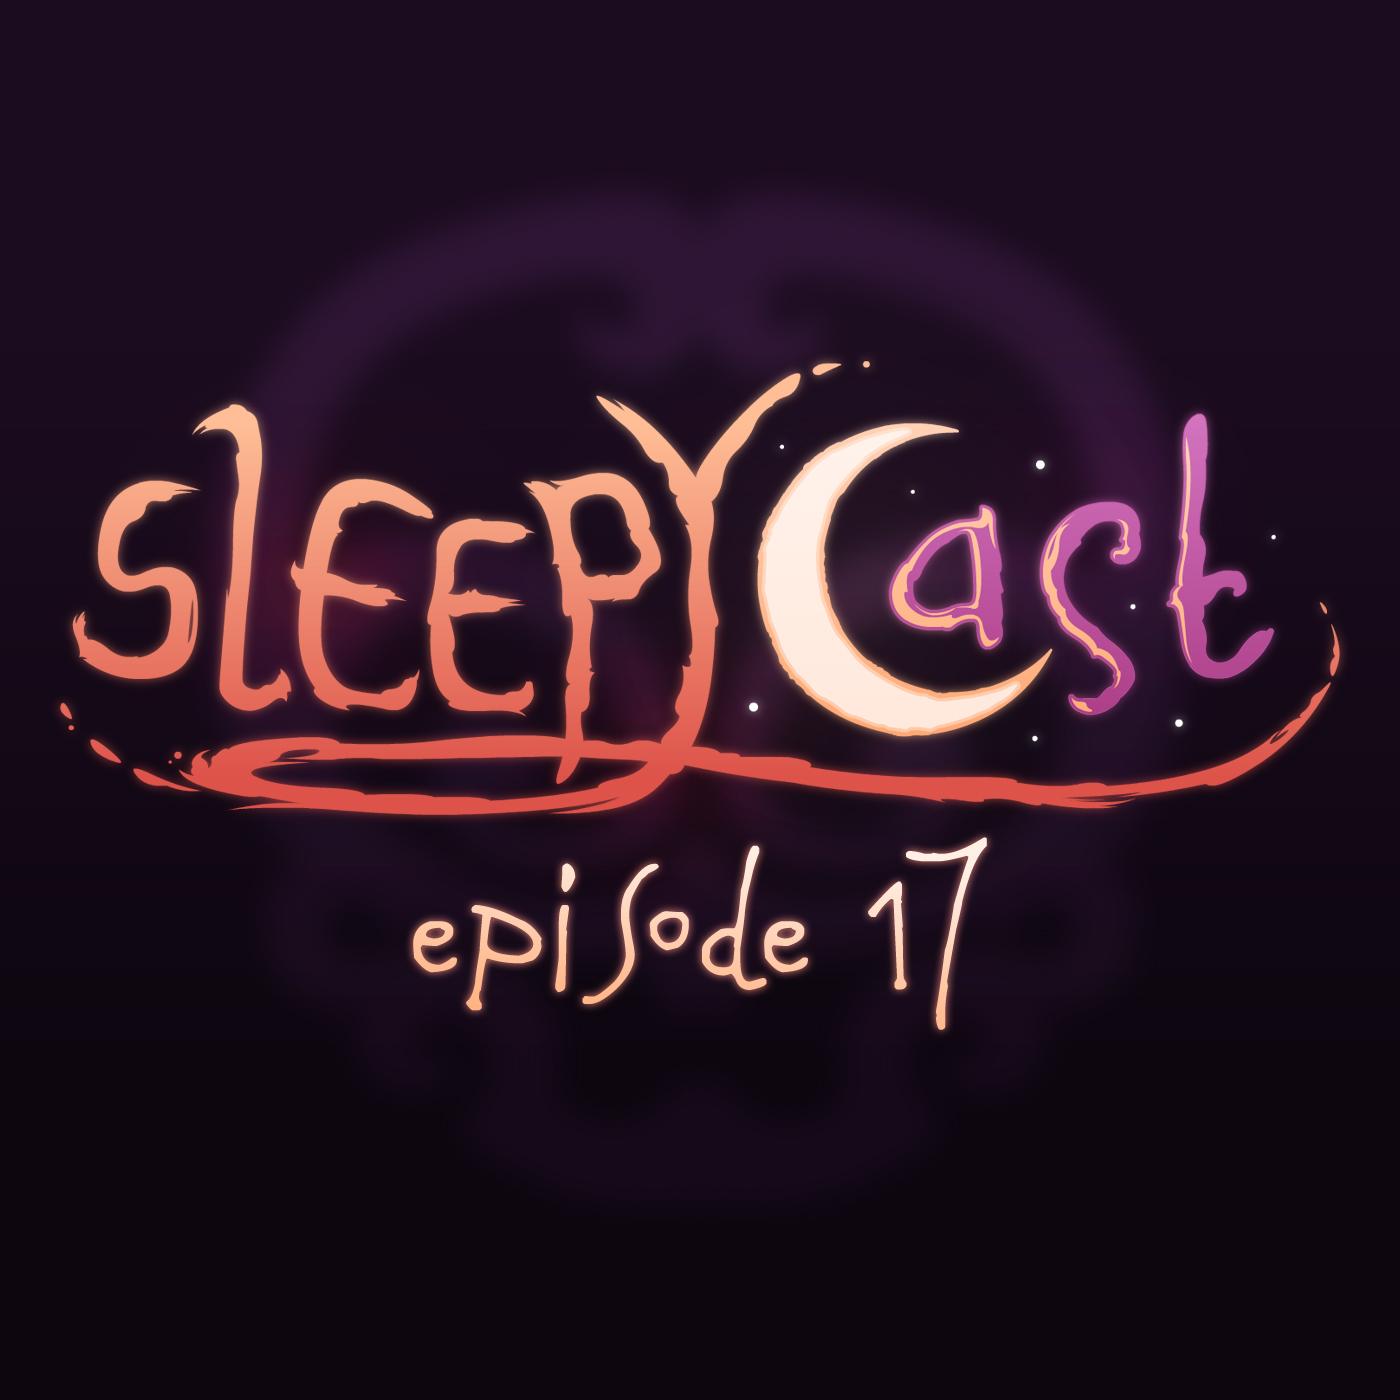 sleepycast 9